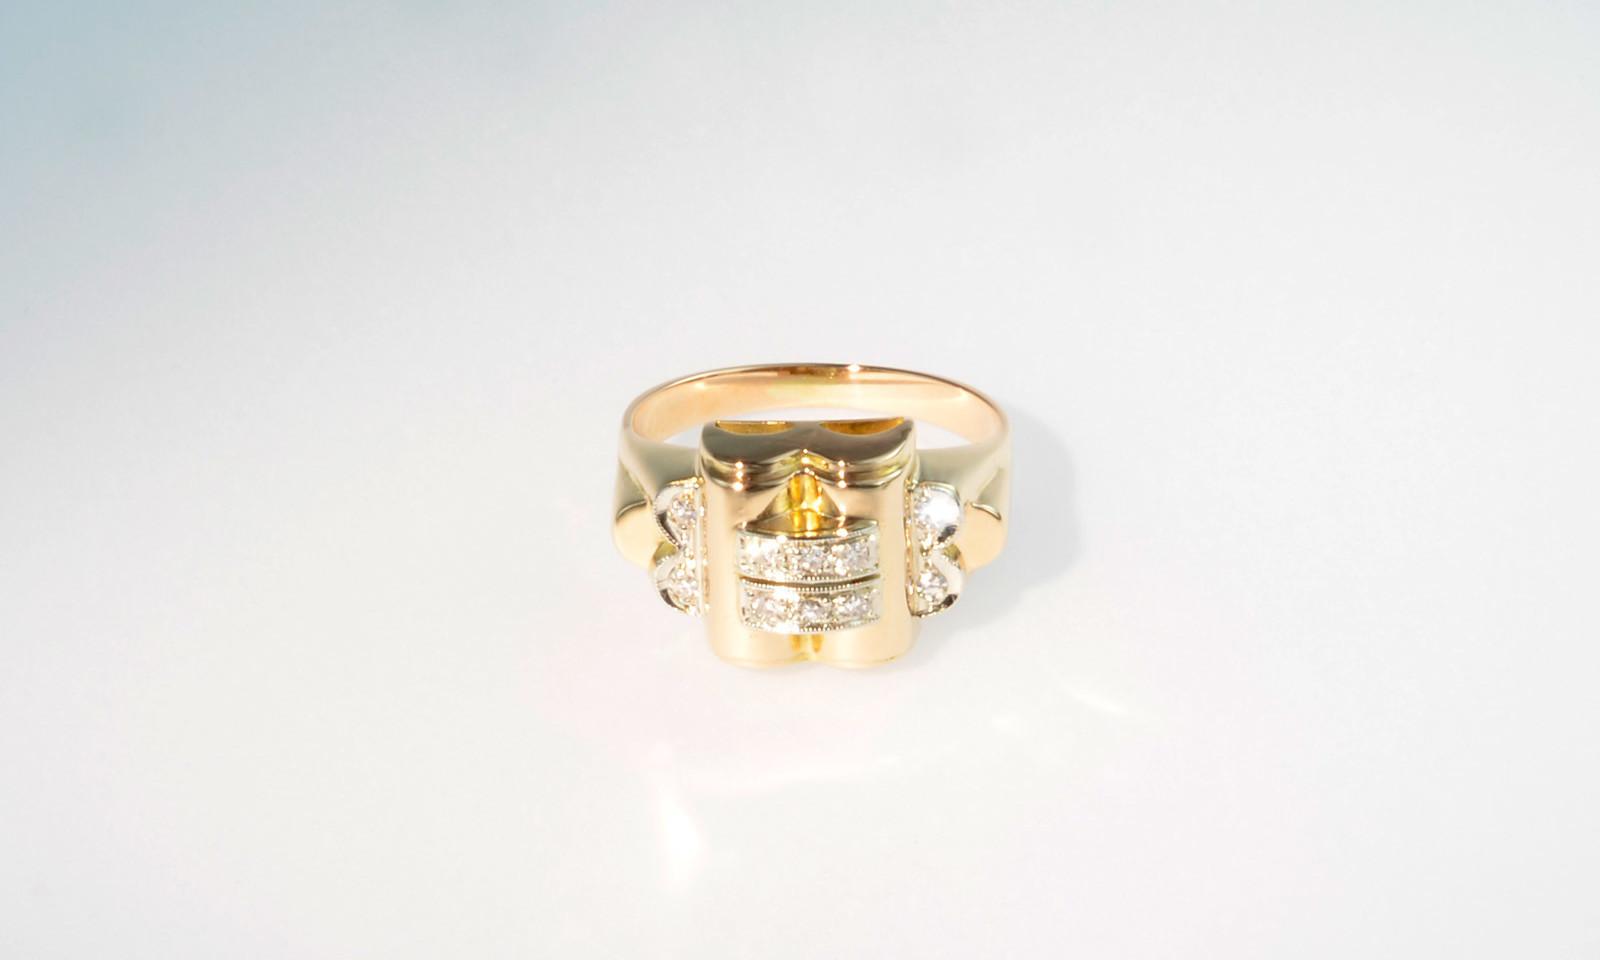 Ring Antik 1930. Ring Art Déco, Paris um 1930, Platin auf Rotgold 750 mit 10 Diamanten, CHF 1400.-